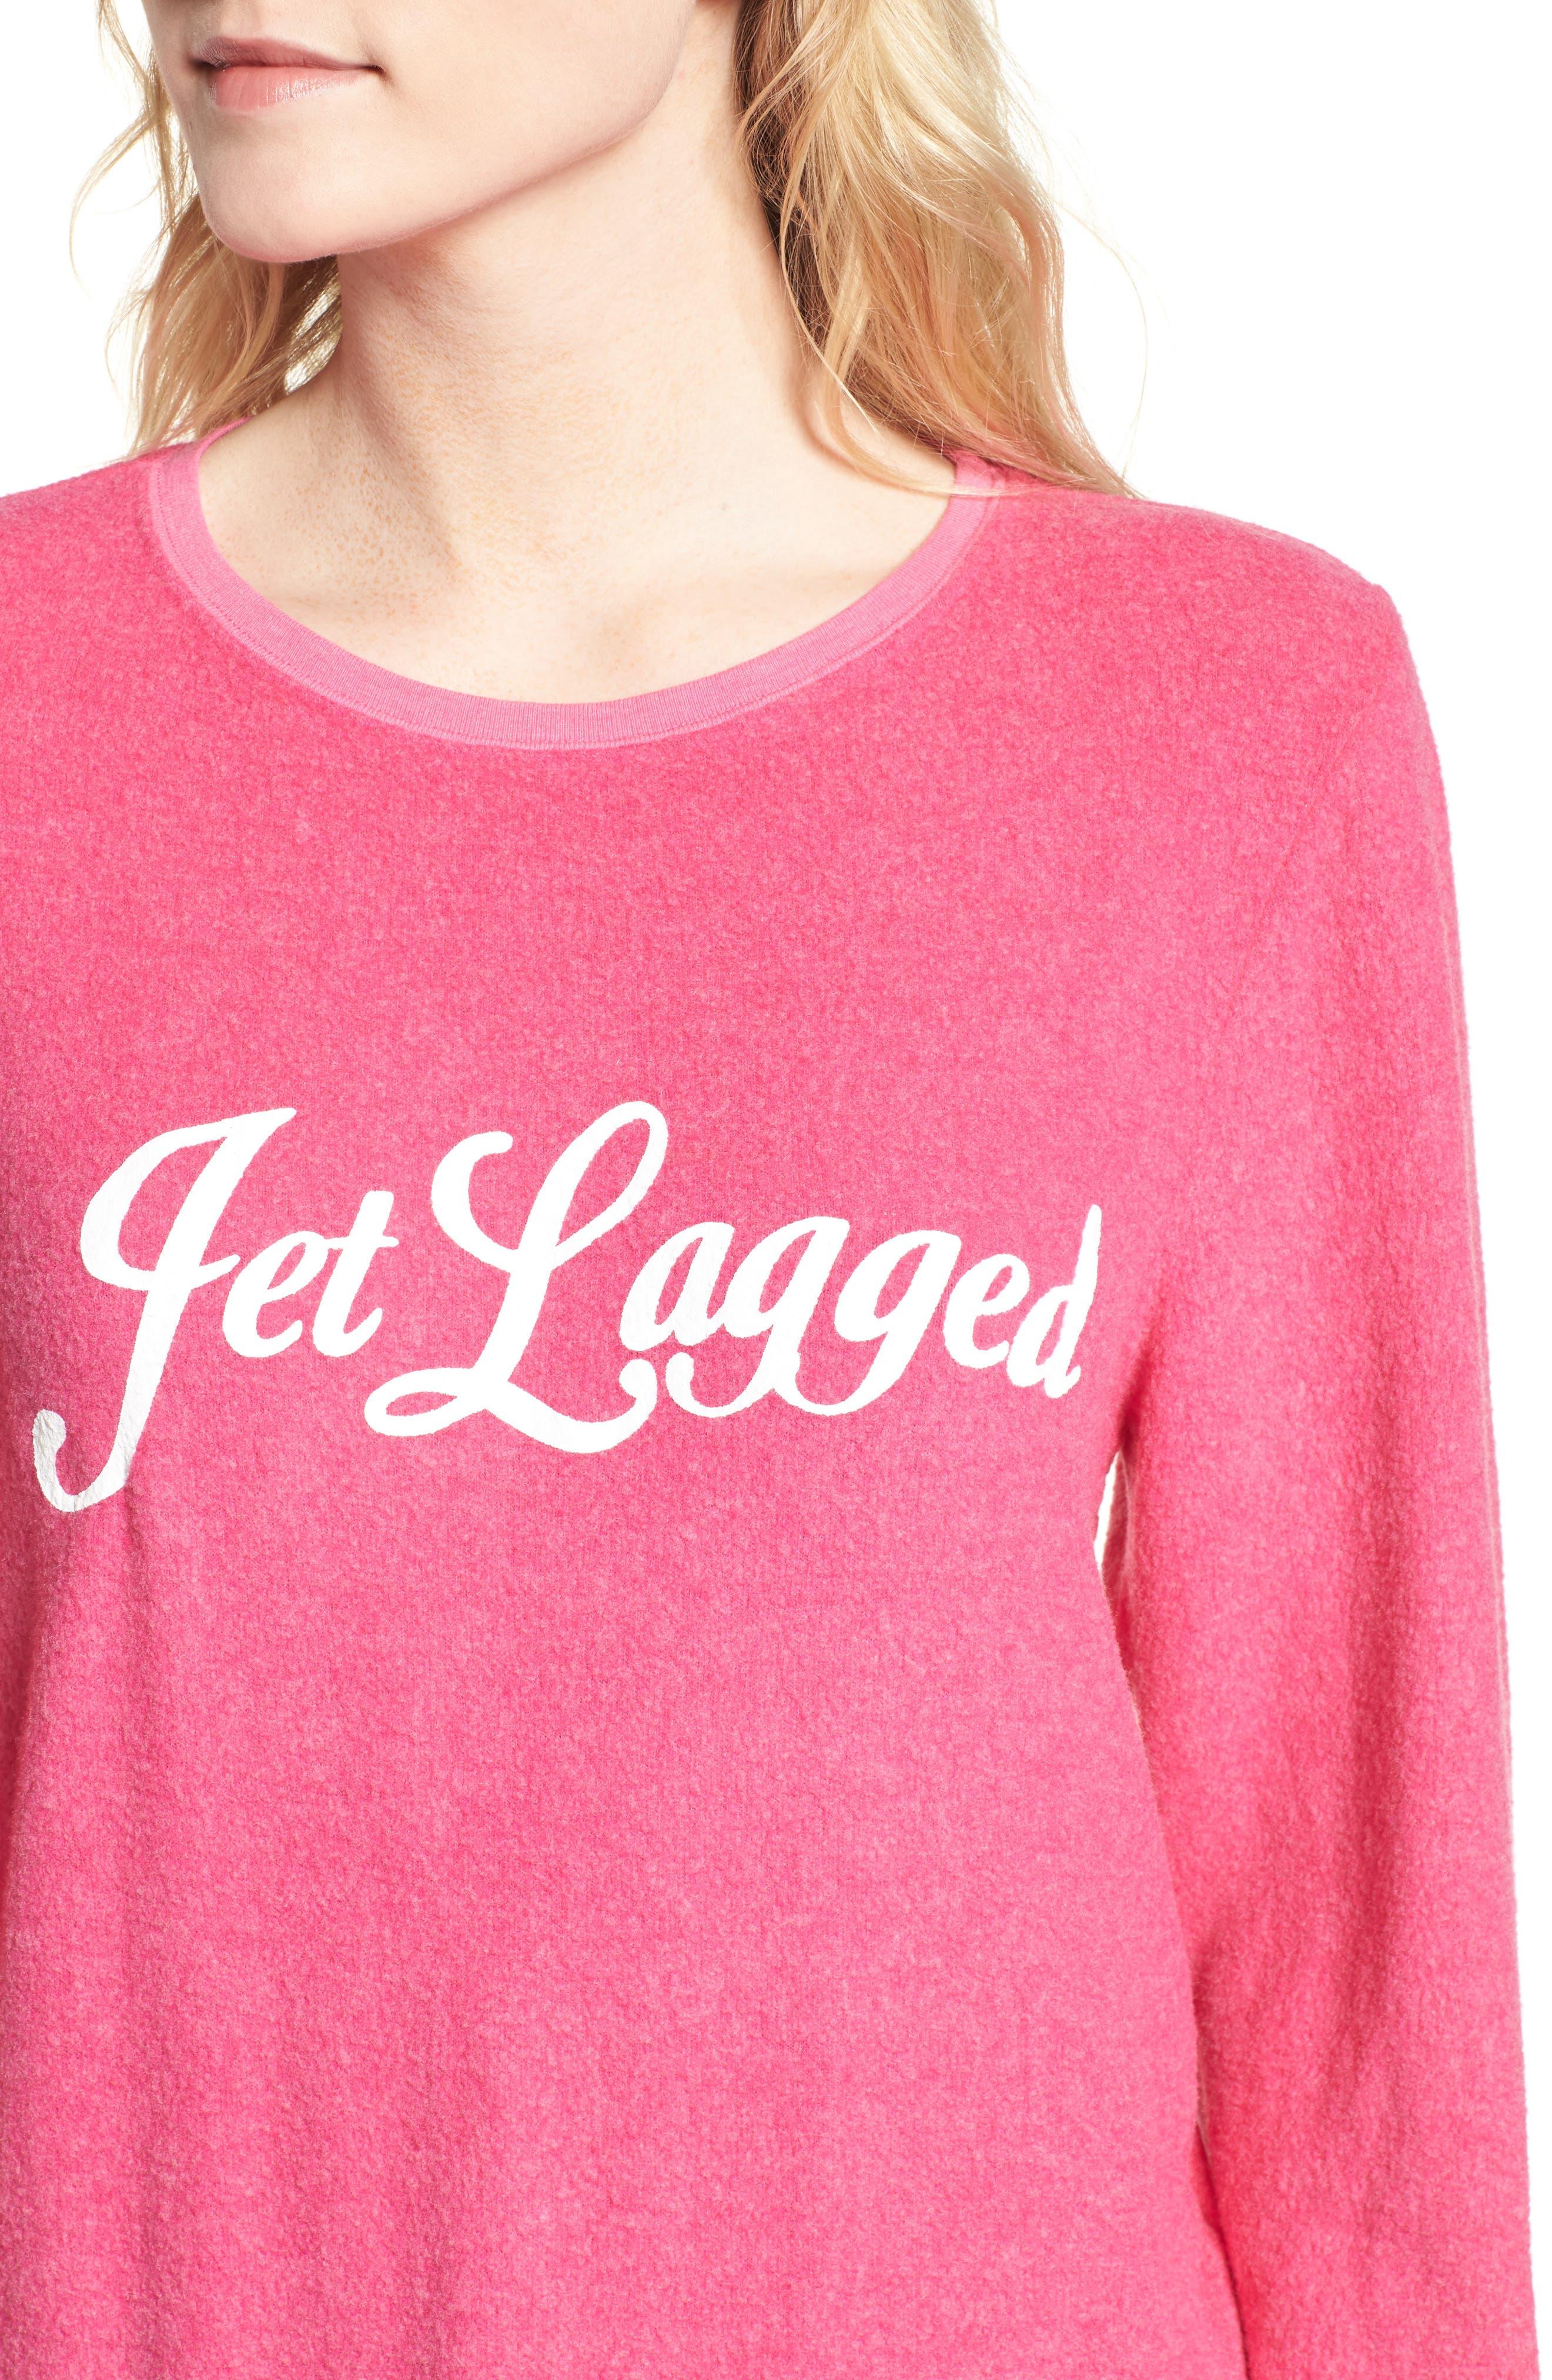 Jet Lagged Sweatshirt,                             Alternate thumbnail 4, color,